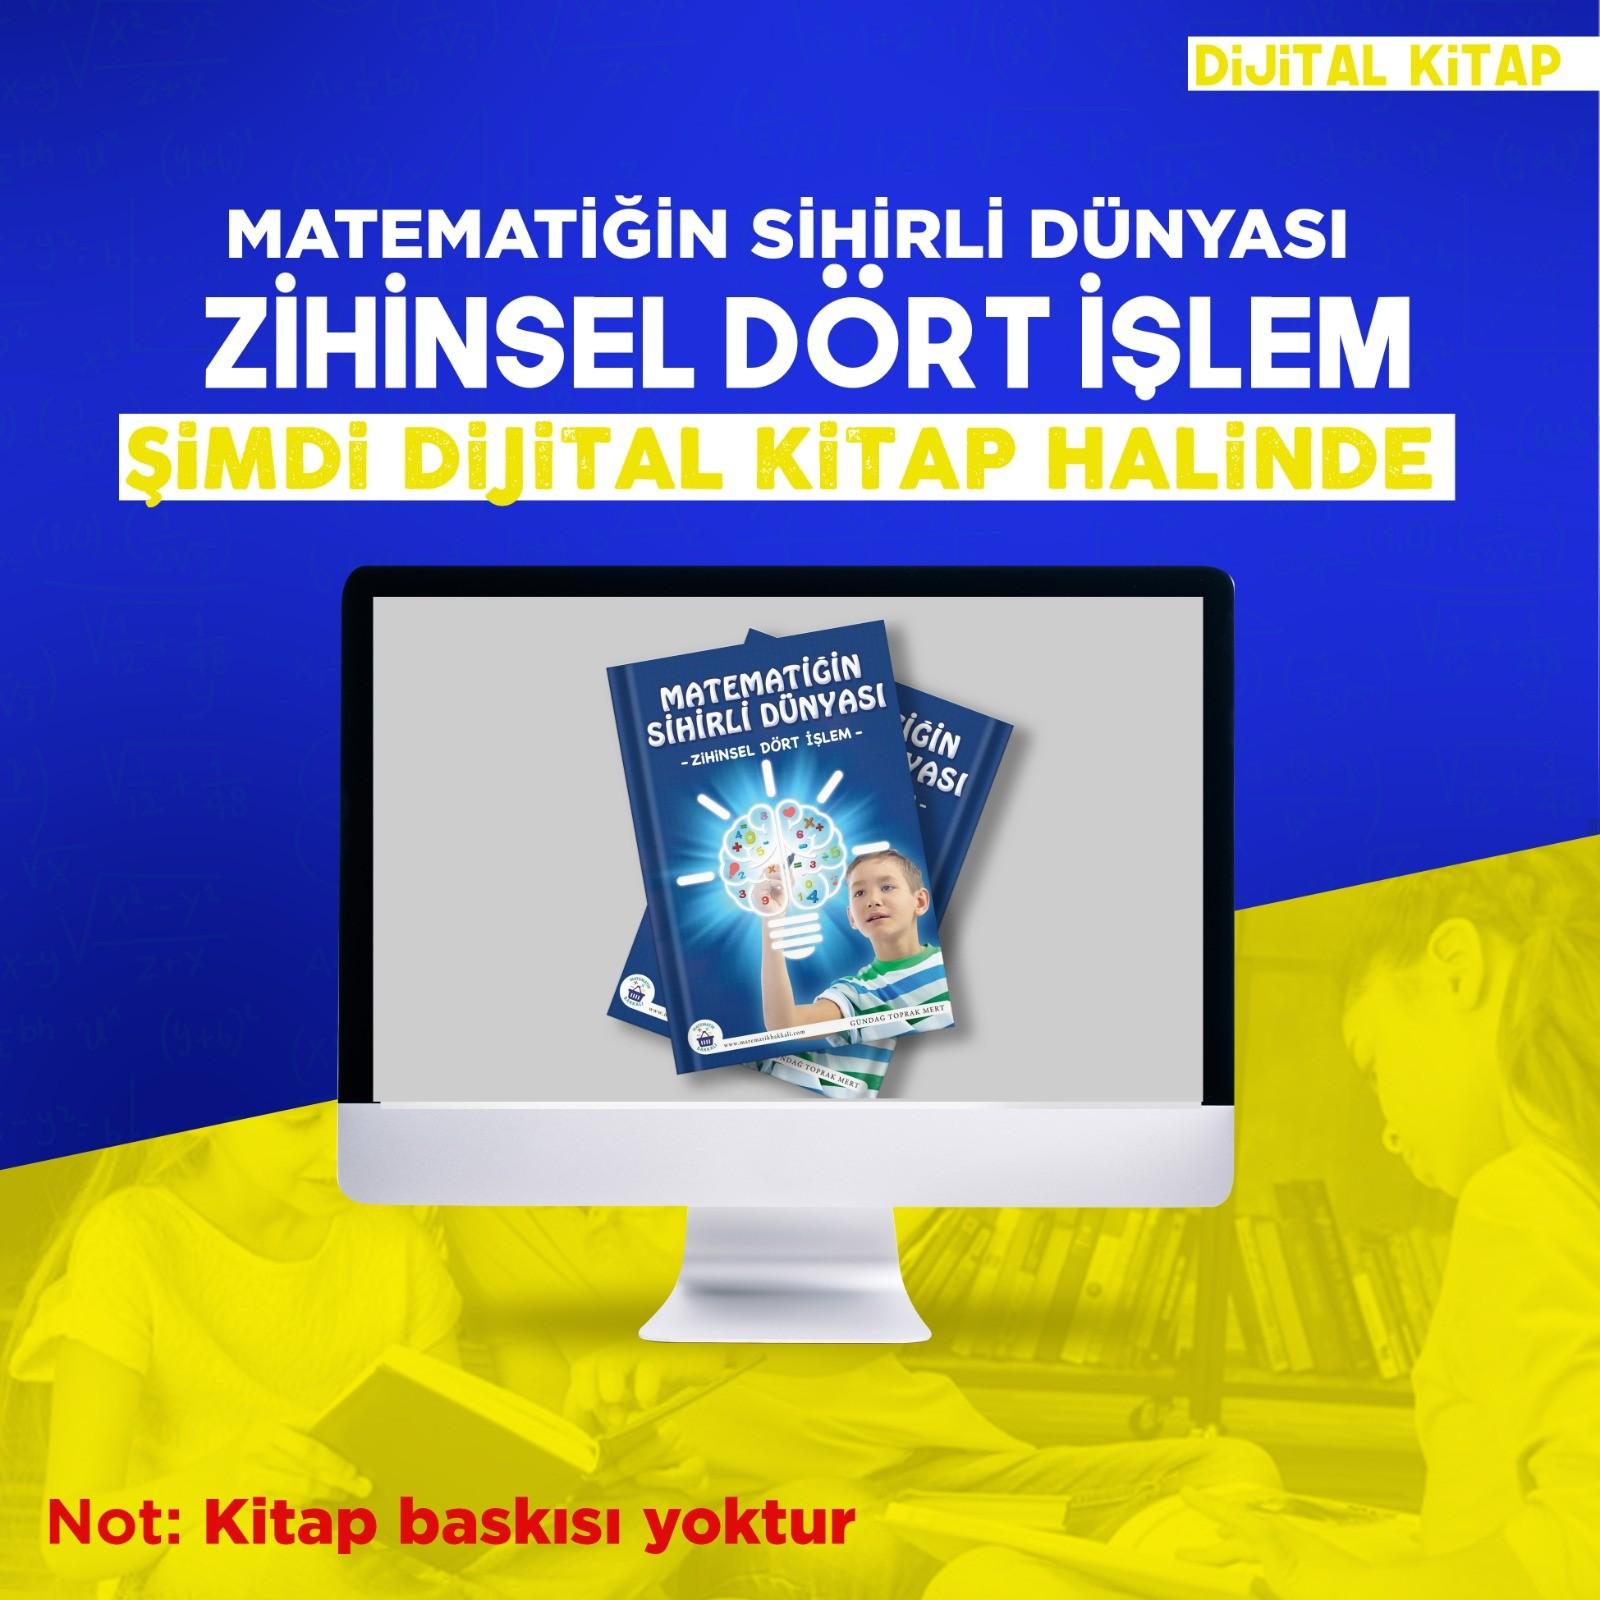 zihinden_dort_islem_e_kitap